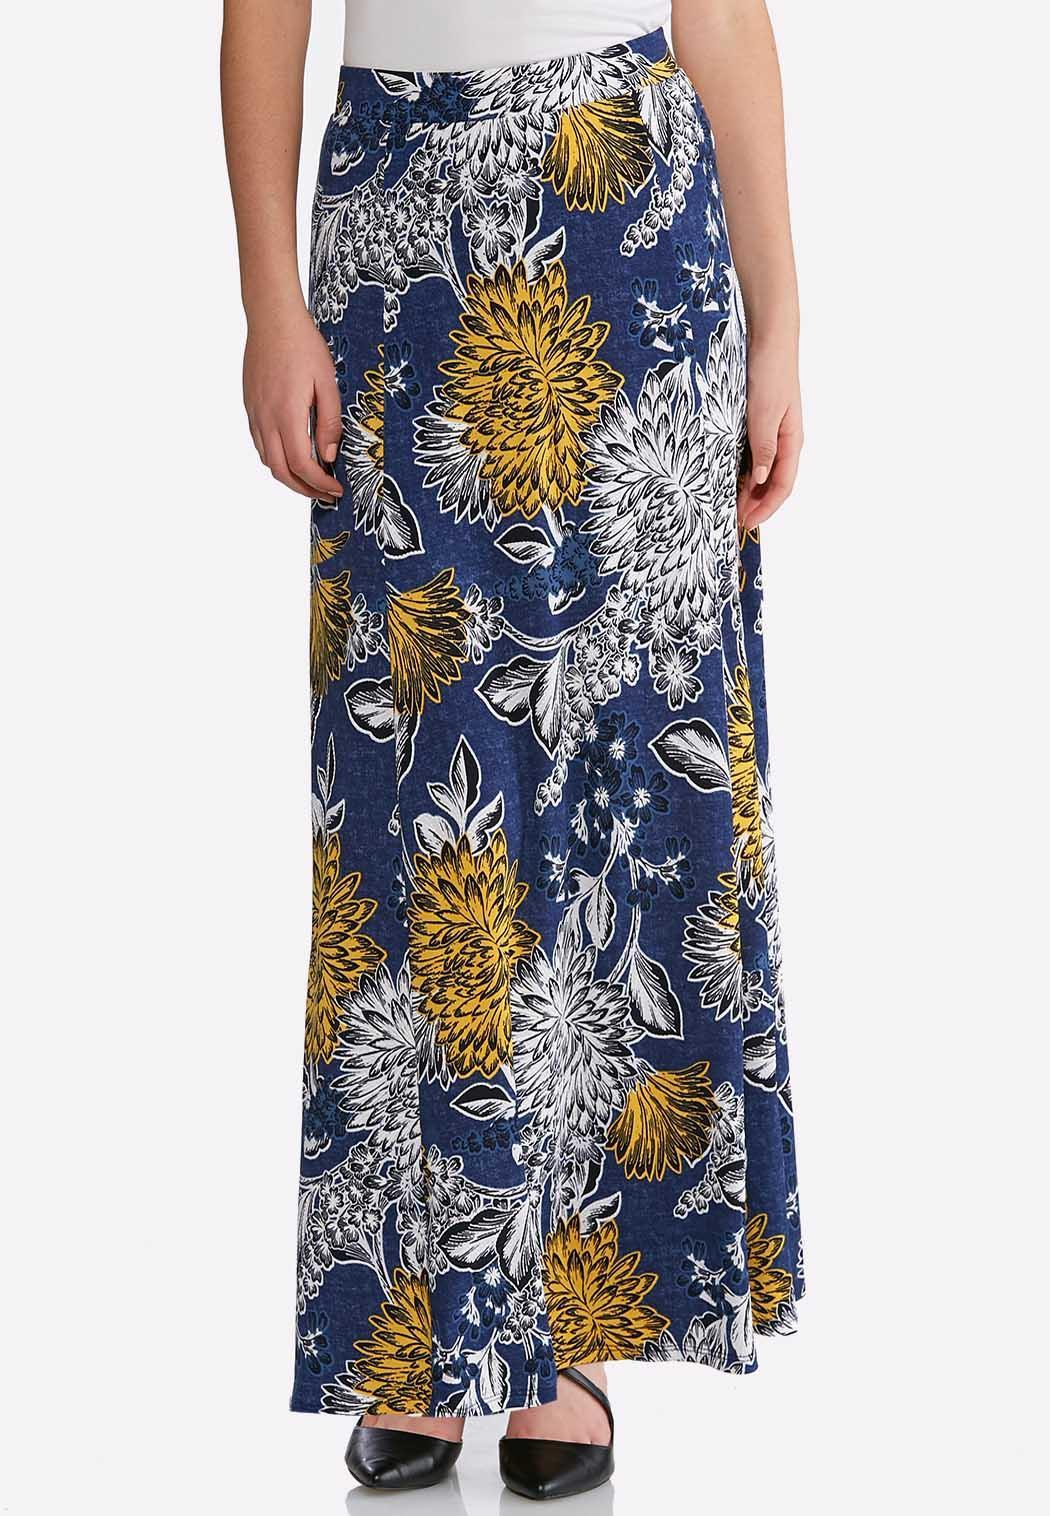 Puff Floral Maxi Skirt